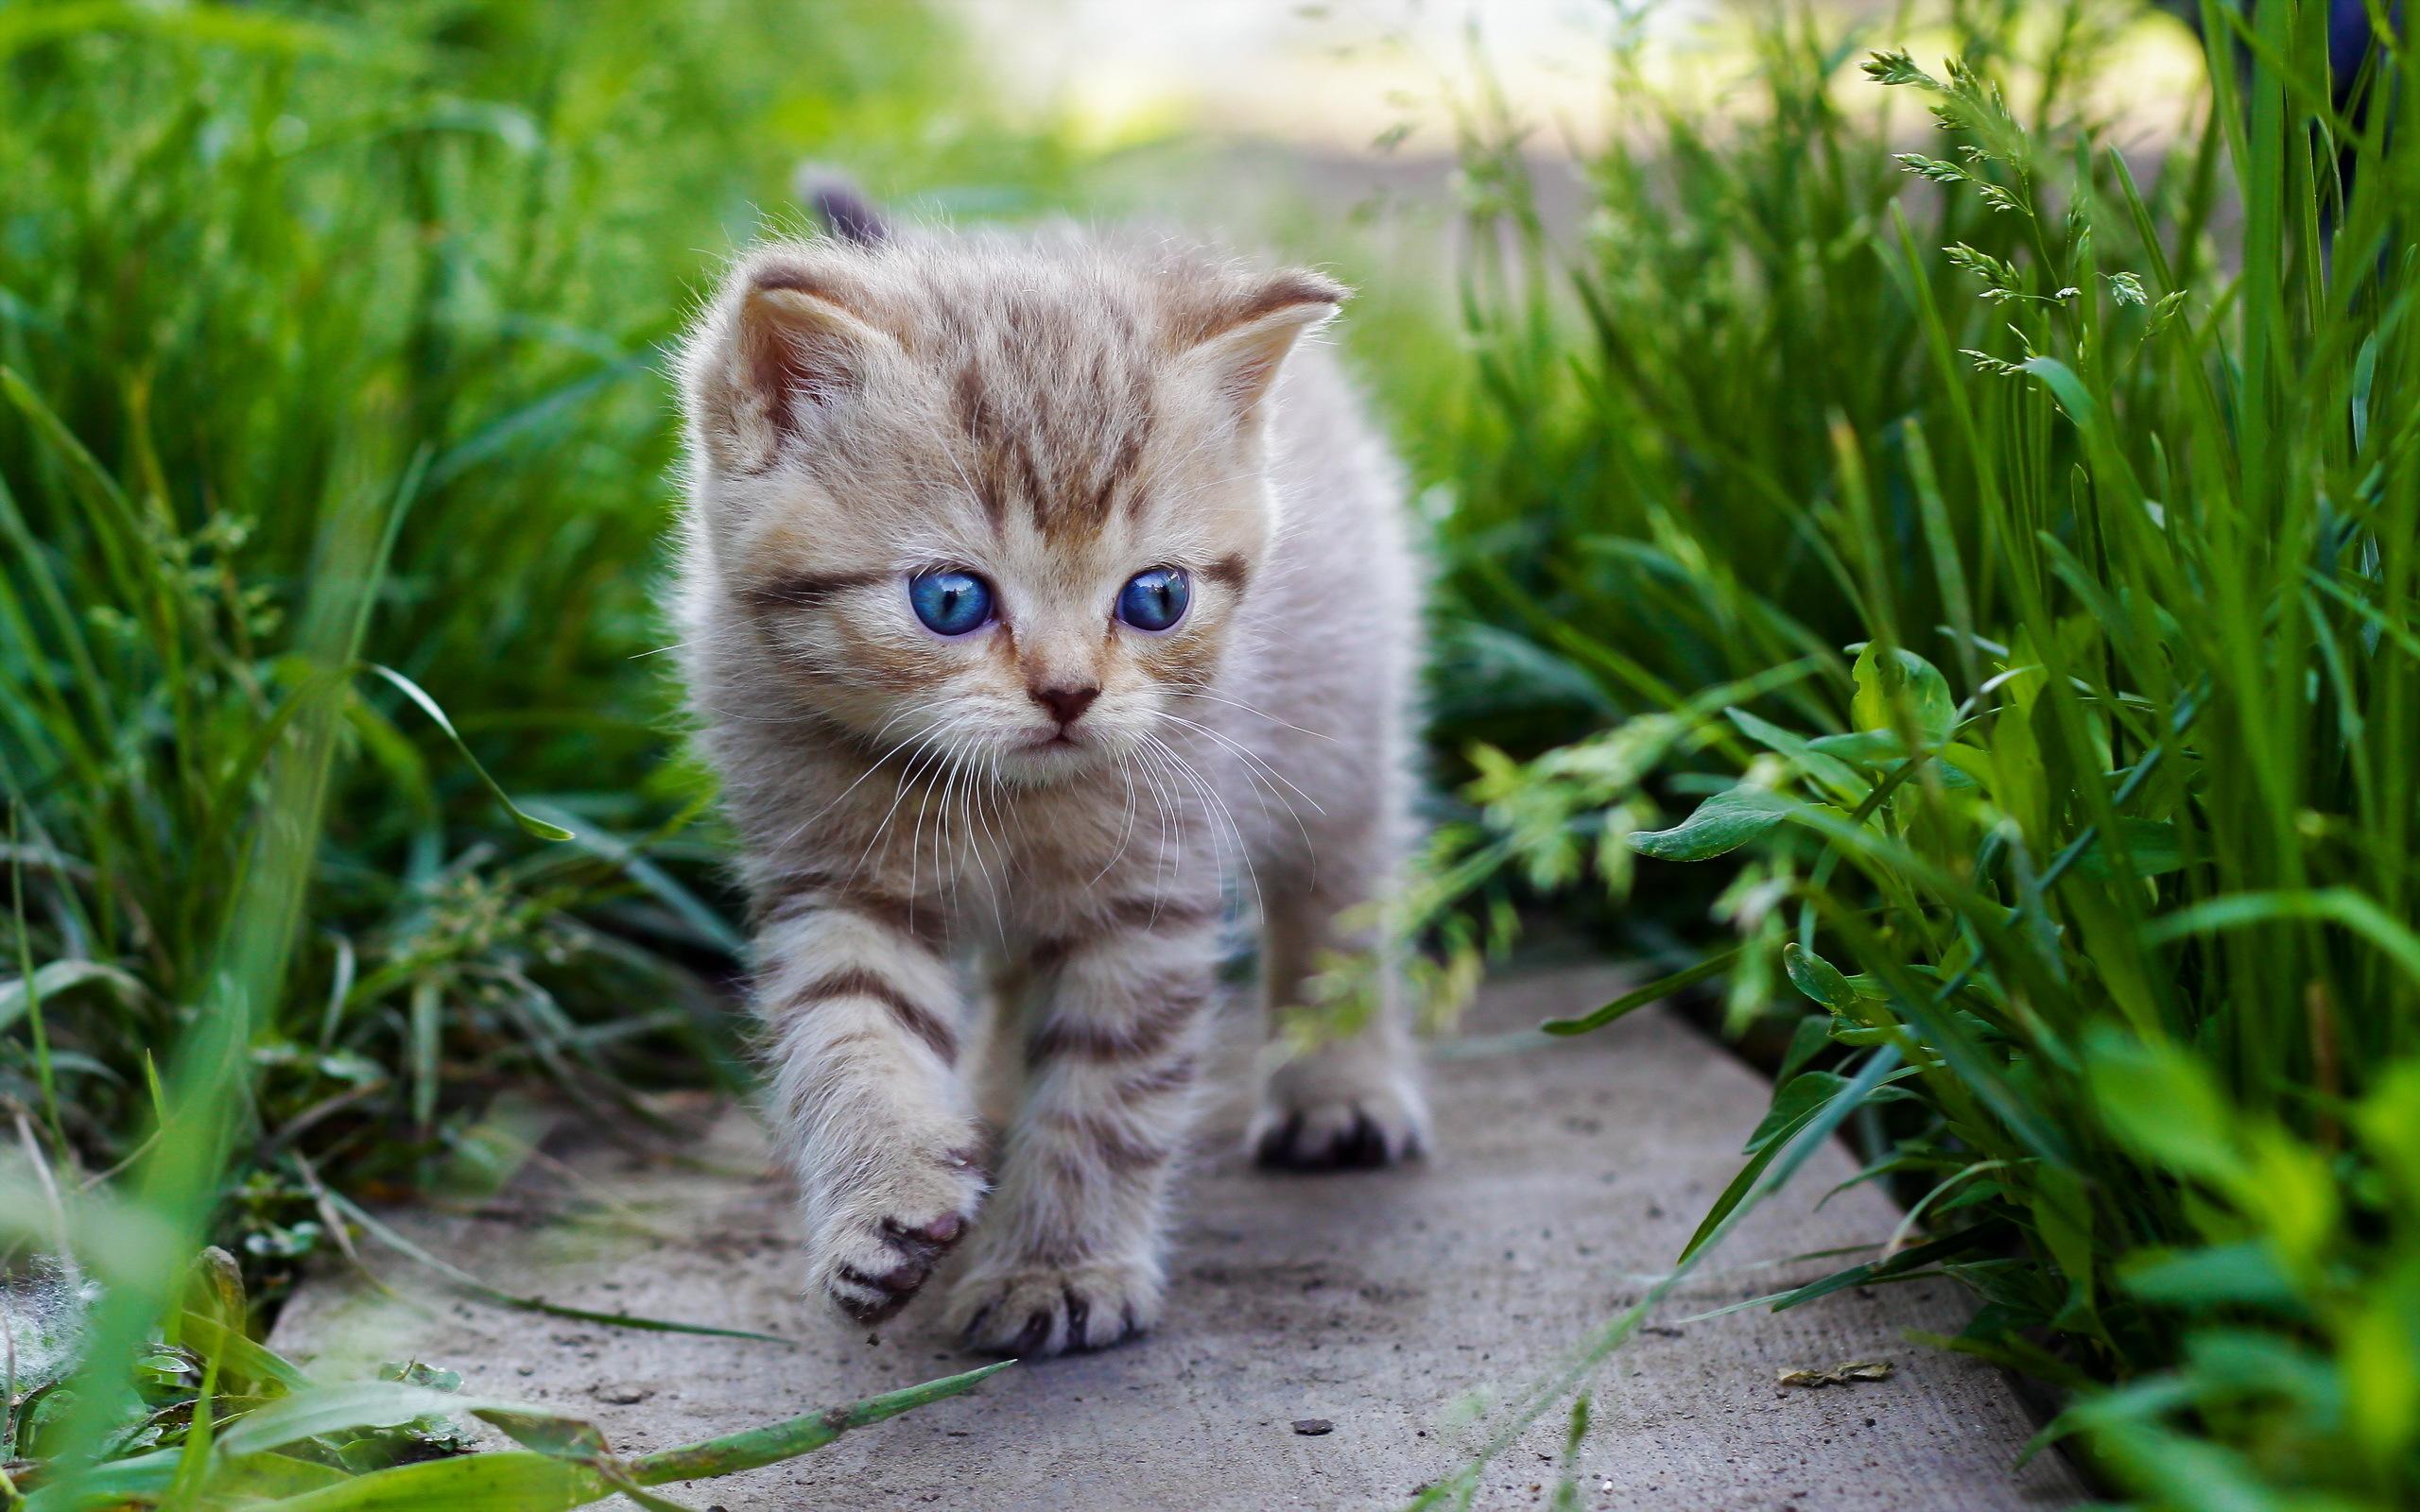 Free Download Pics Photos Hd Wallpaper Cute Baby Cat For Desktop 2560x1600 For Your Desktop Mobile Tablet Explore 76 Baby Kitten Wallpaper Cute Kittens Wallpapers Free Kittens Wallpaper For